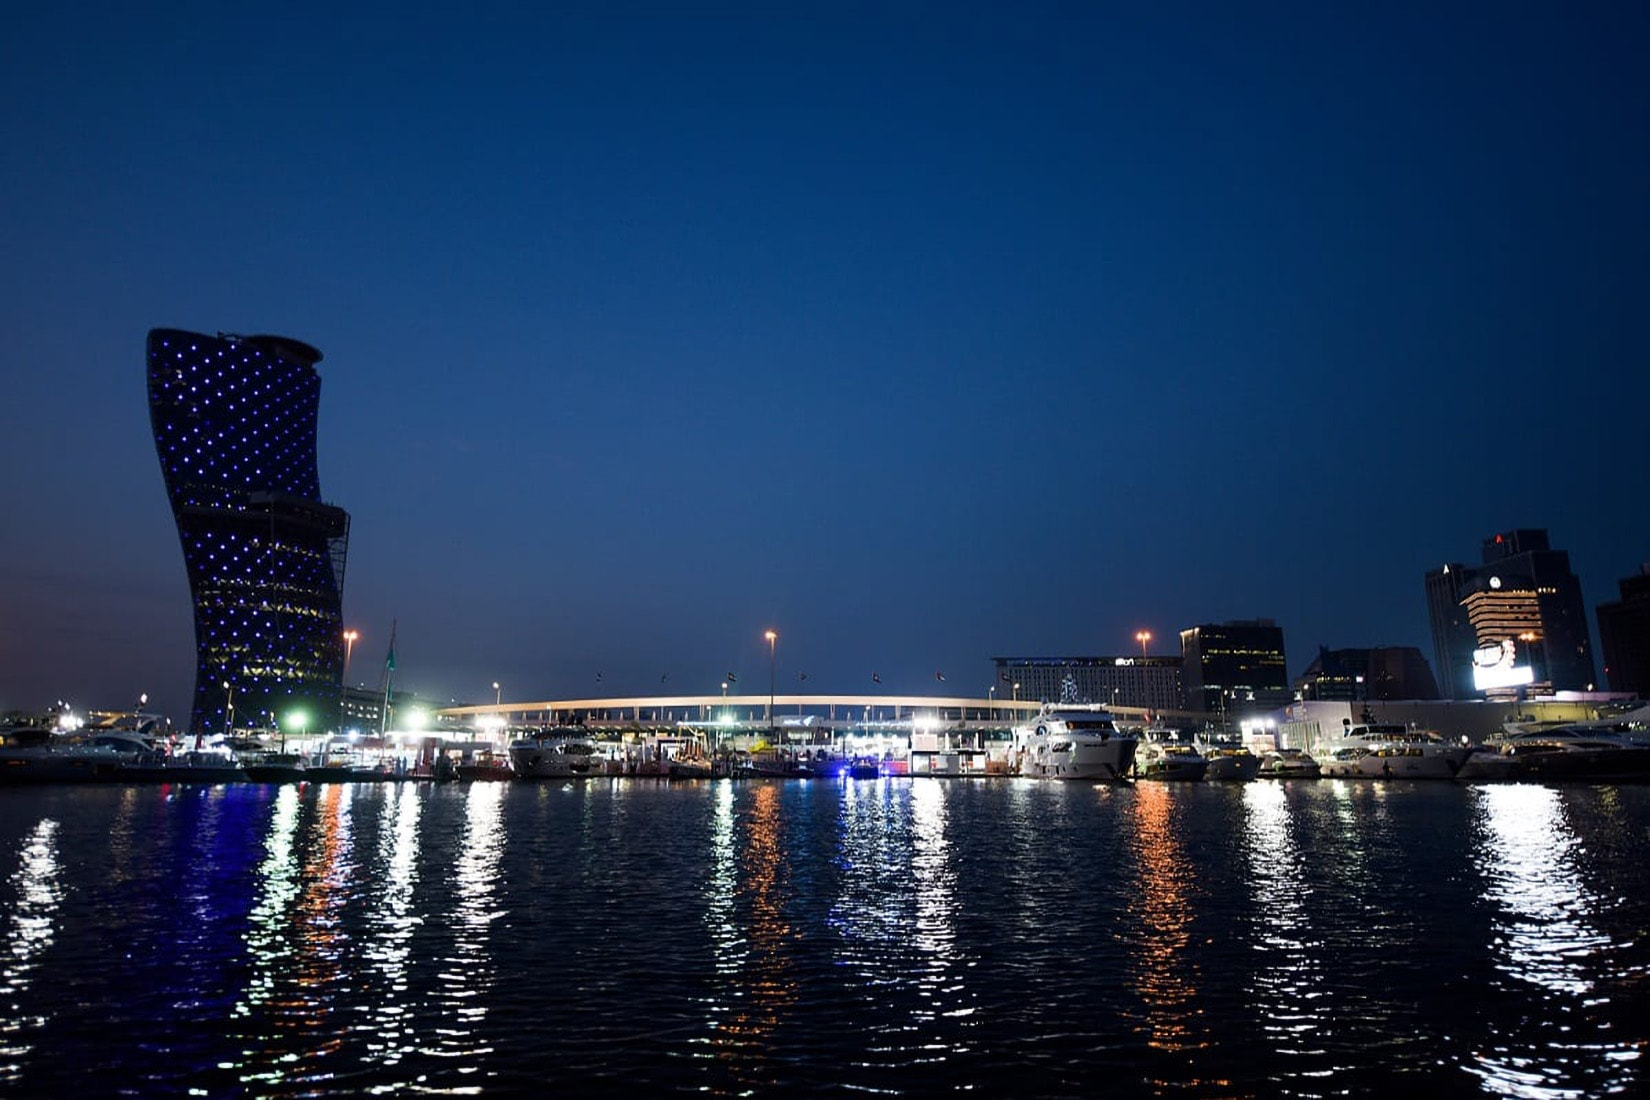 Abu Dhabi International Boat Show 2021 marina - Luxe Digital